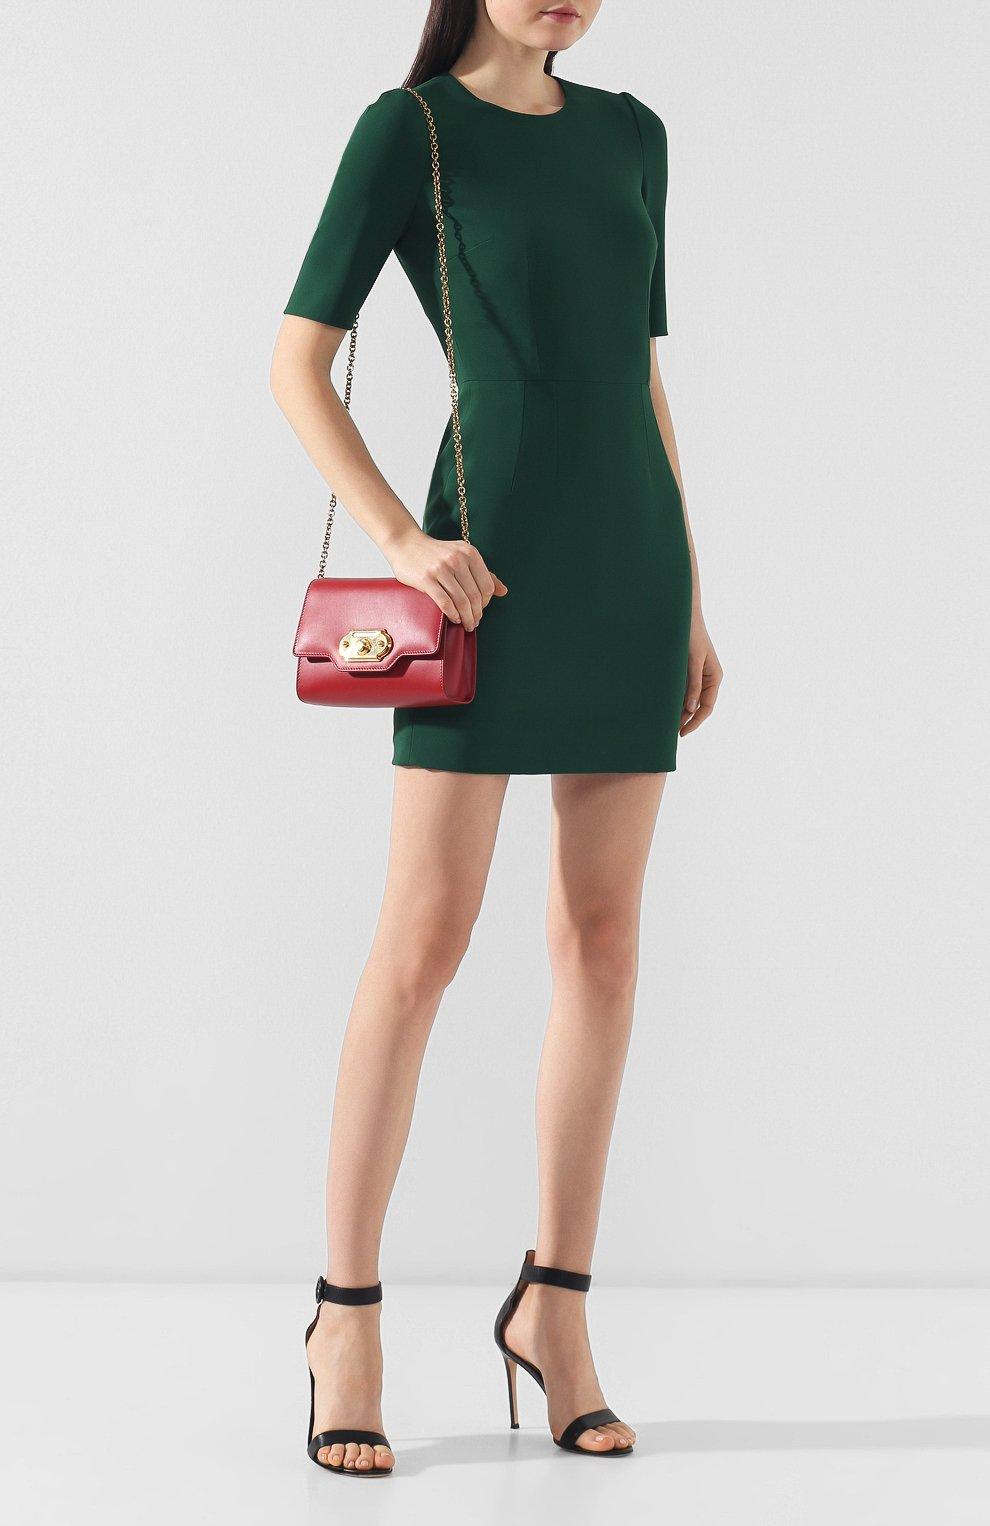 Сумка Welcome Dolce & Gabbana красная цвета   Фото №2